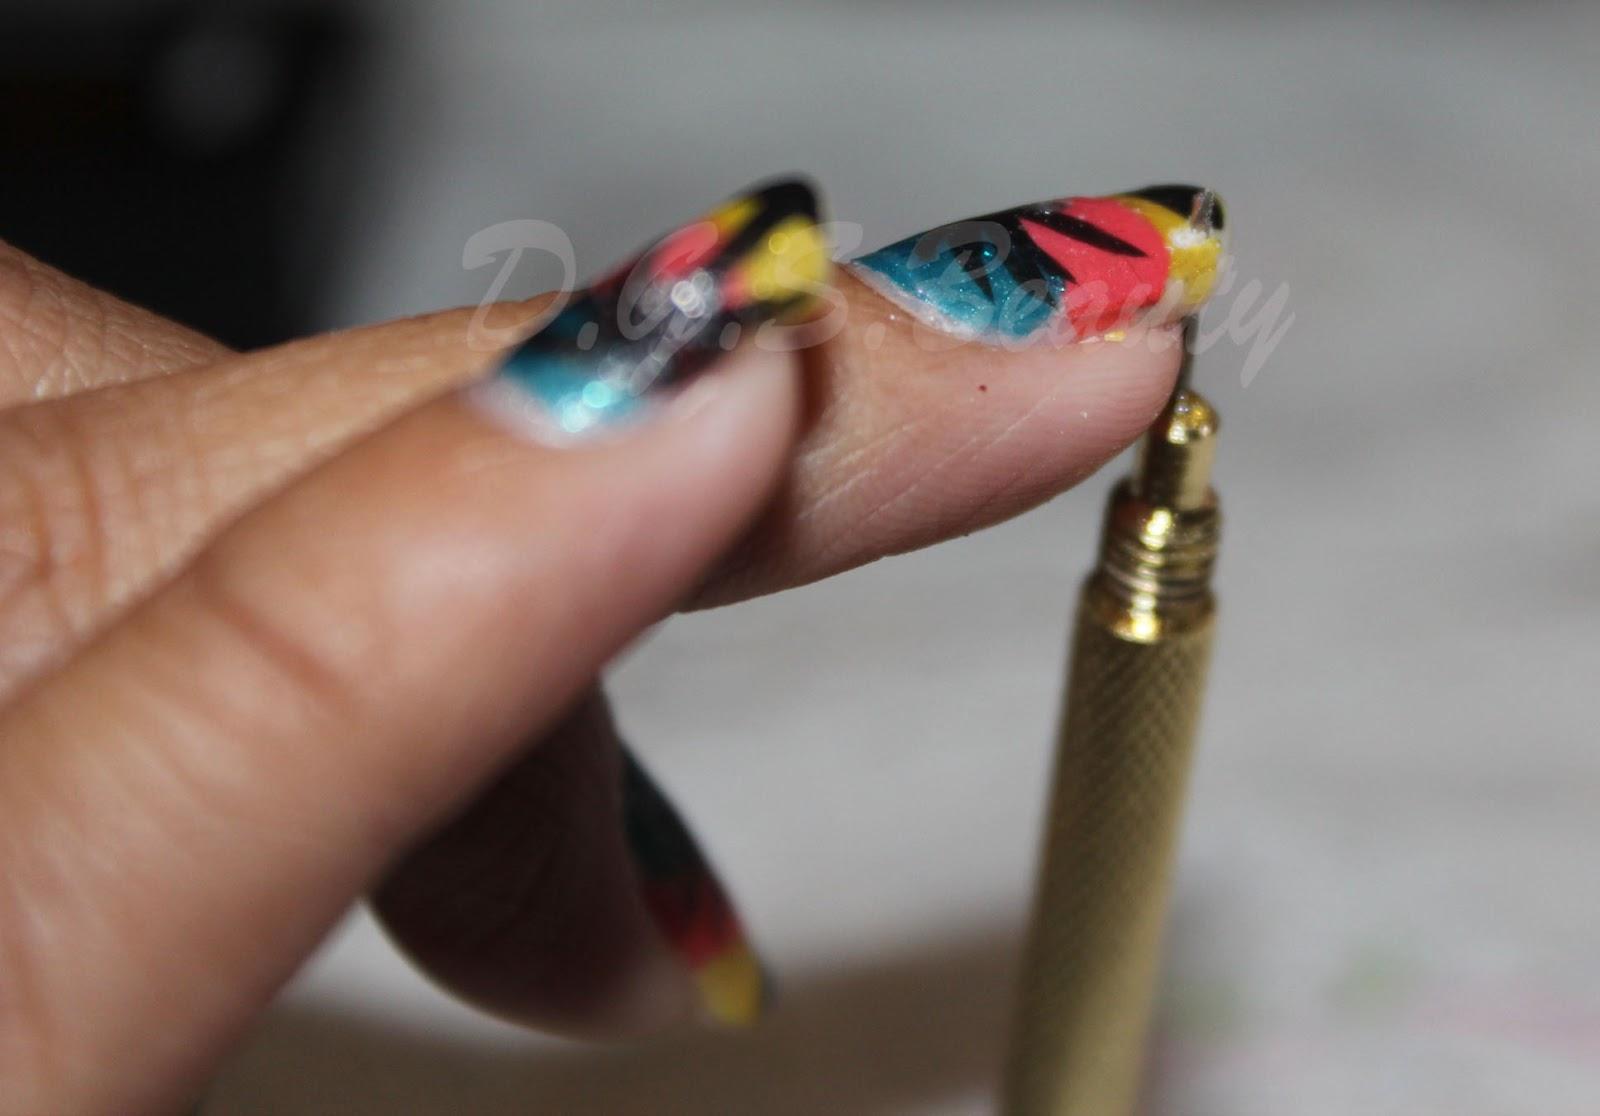 Born Pretty Nail Dangle Charm Review | D.G.S.Beauty